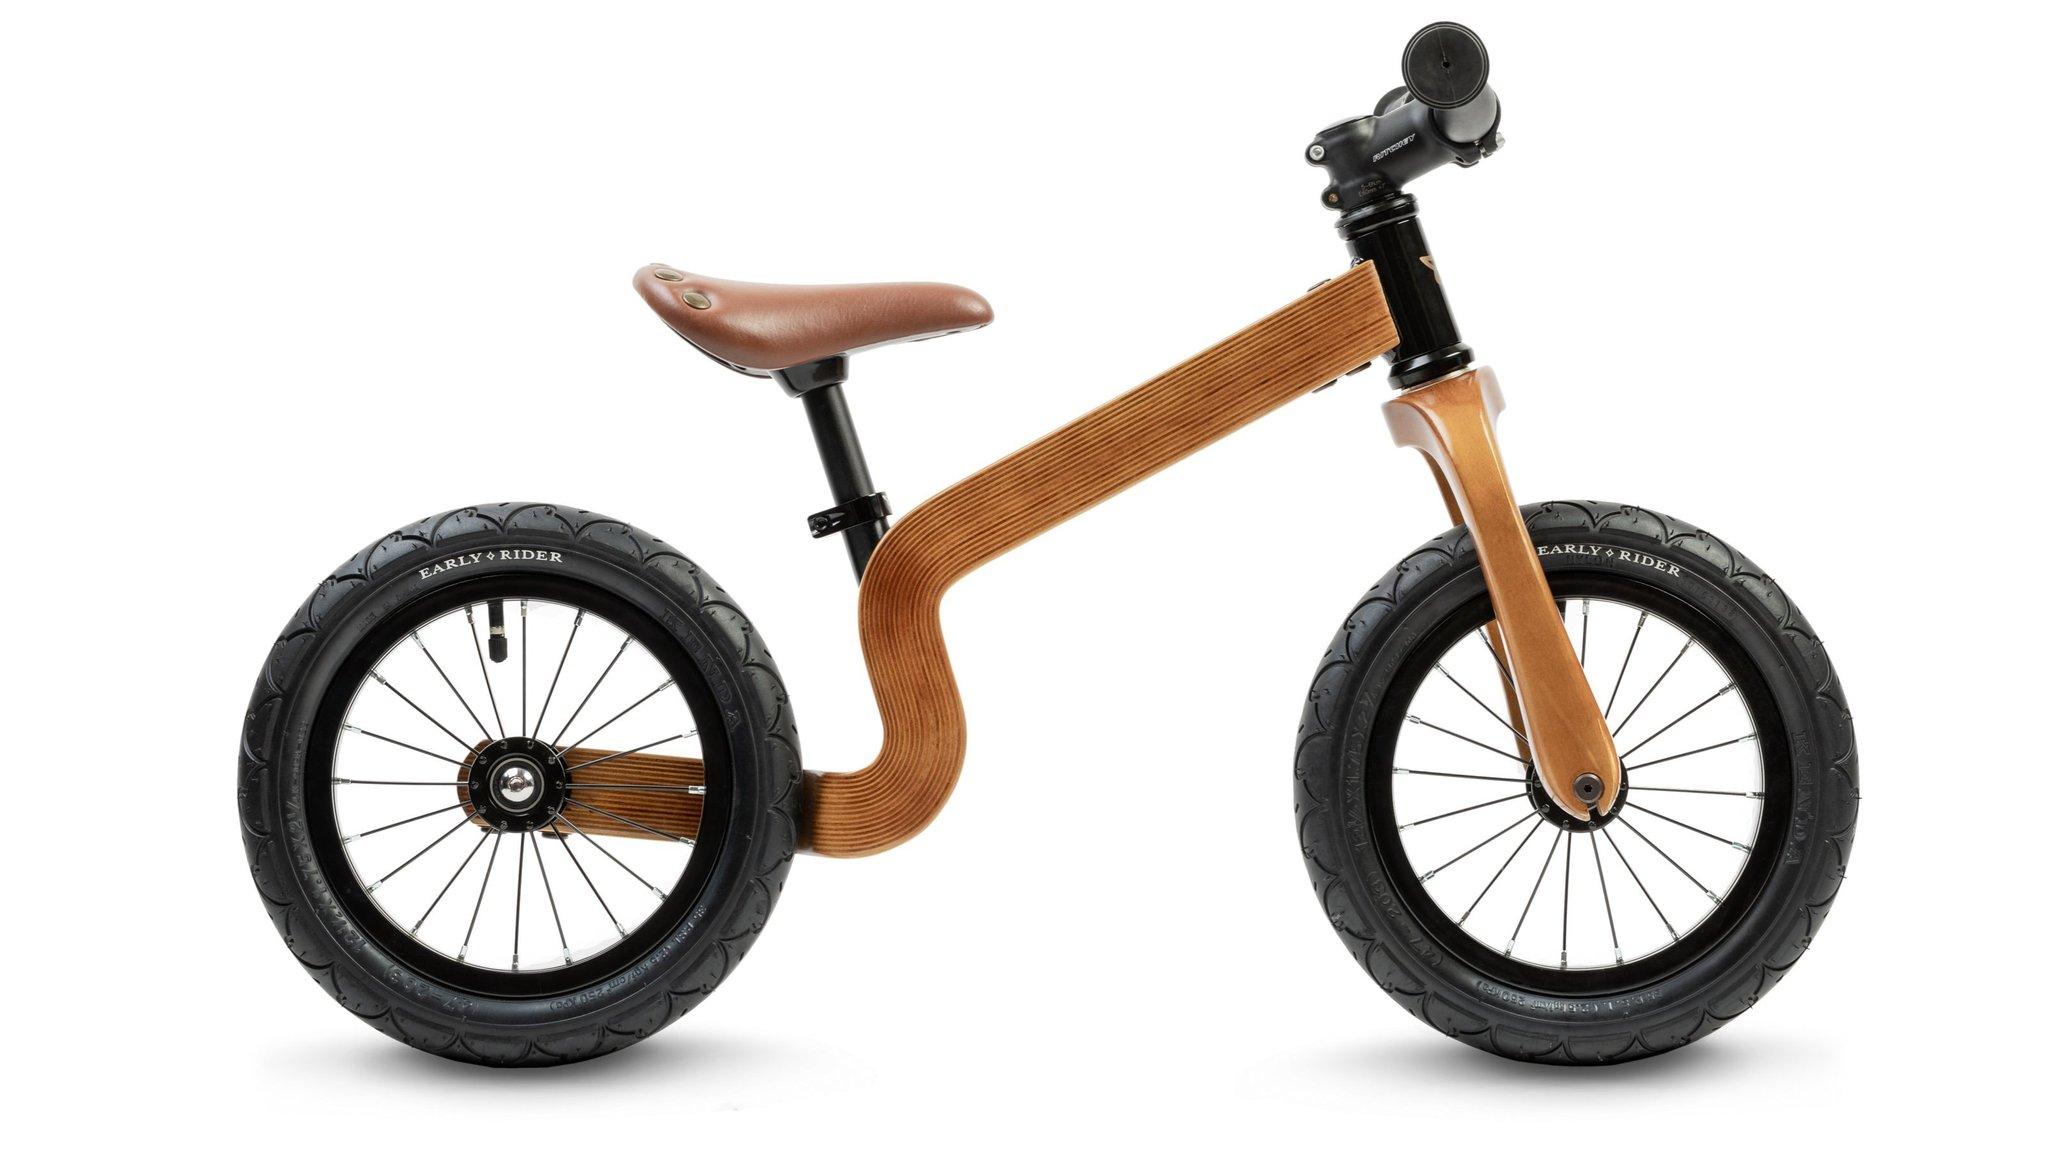 early-rider-balance-wooden-bike_2048x